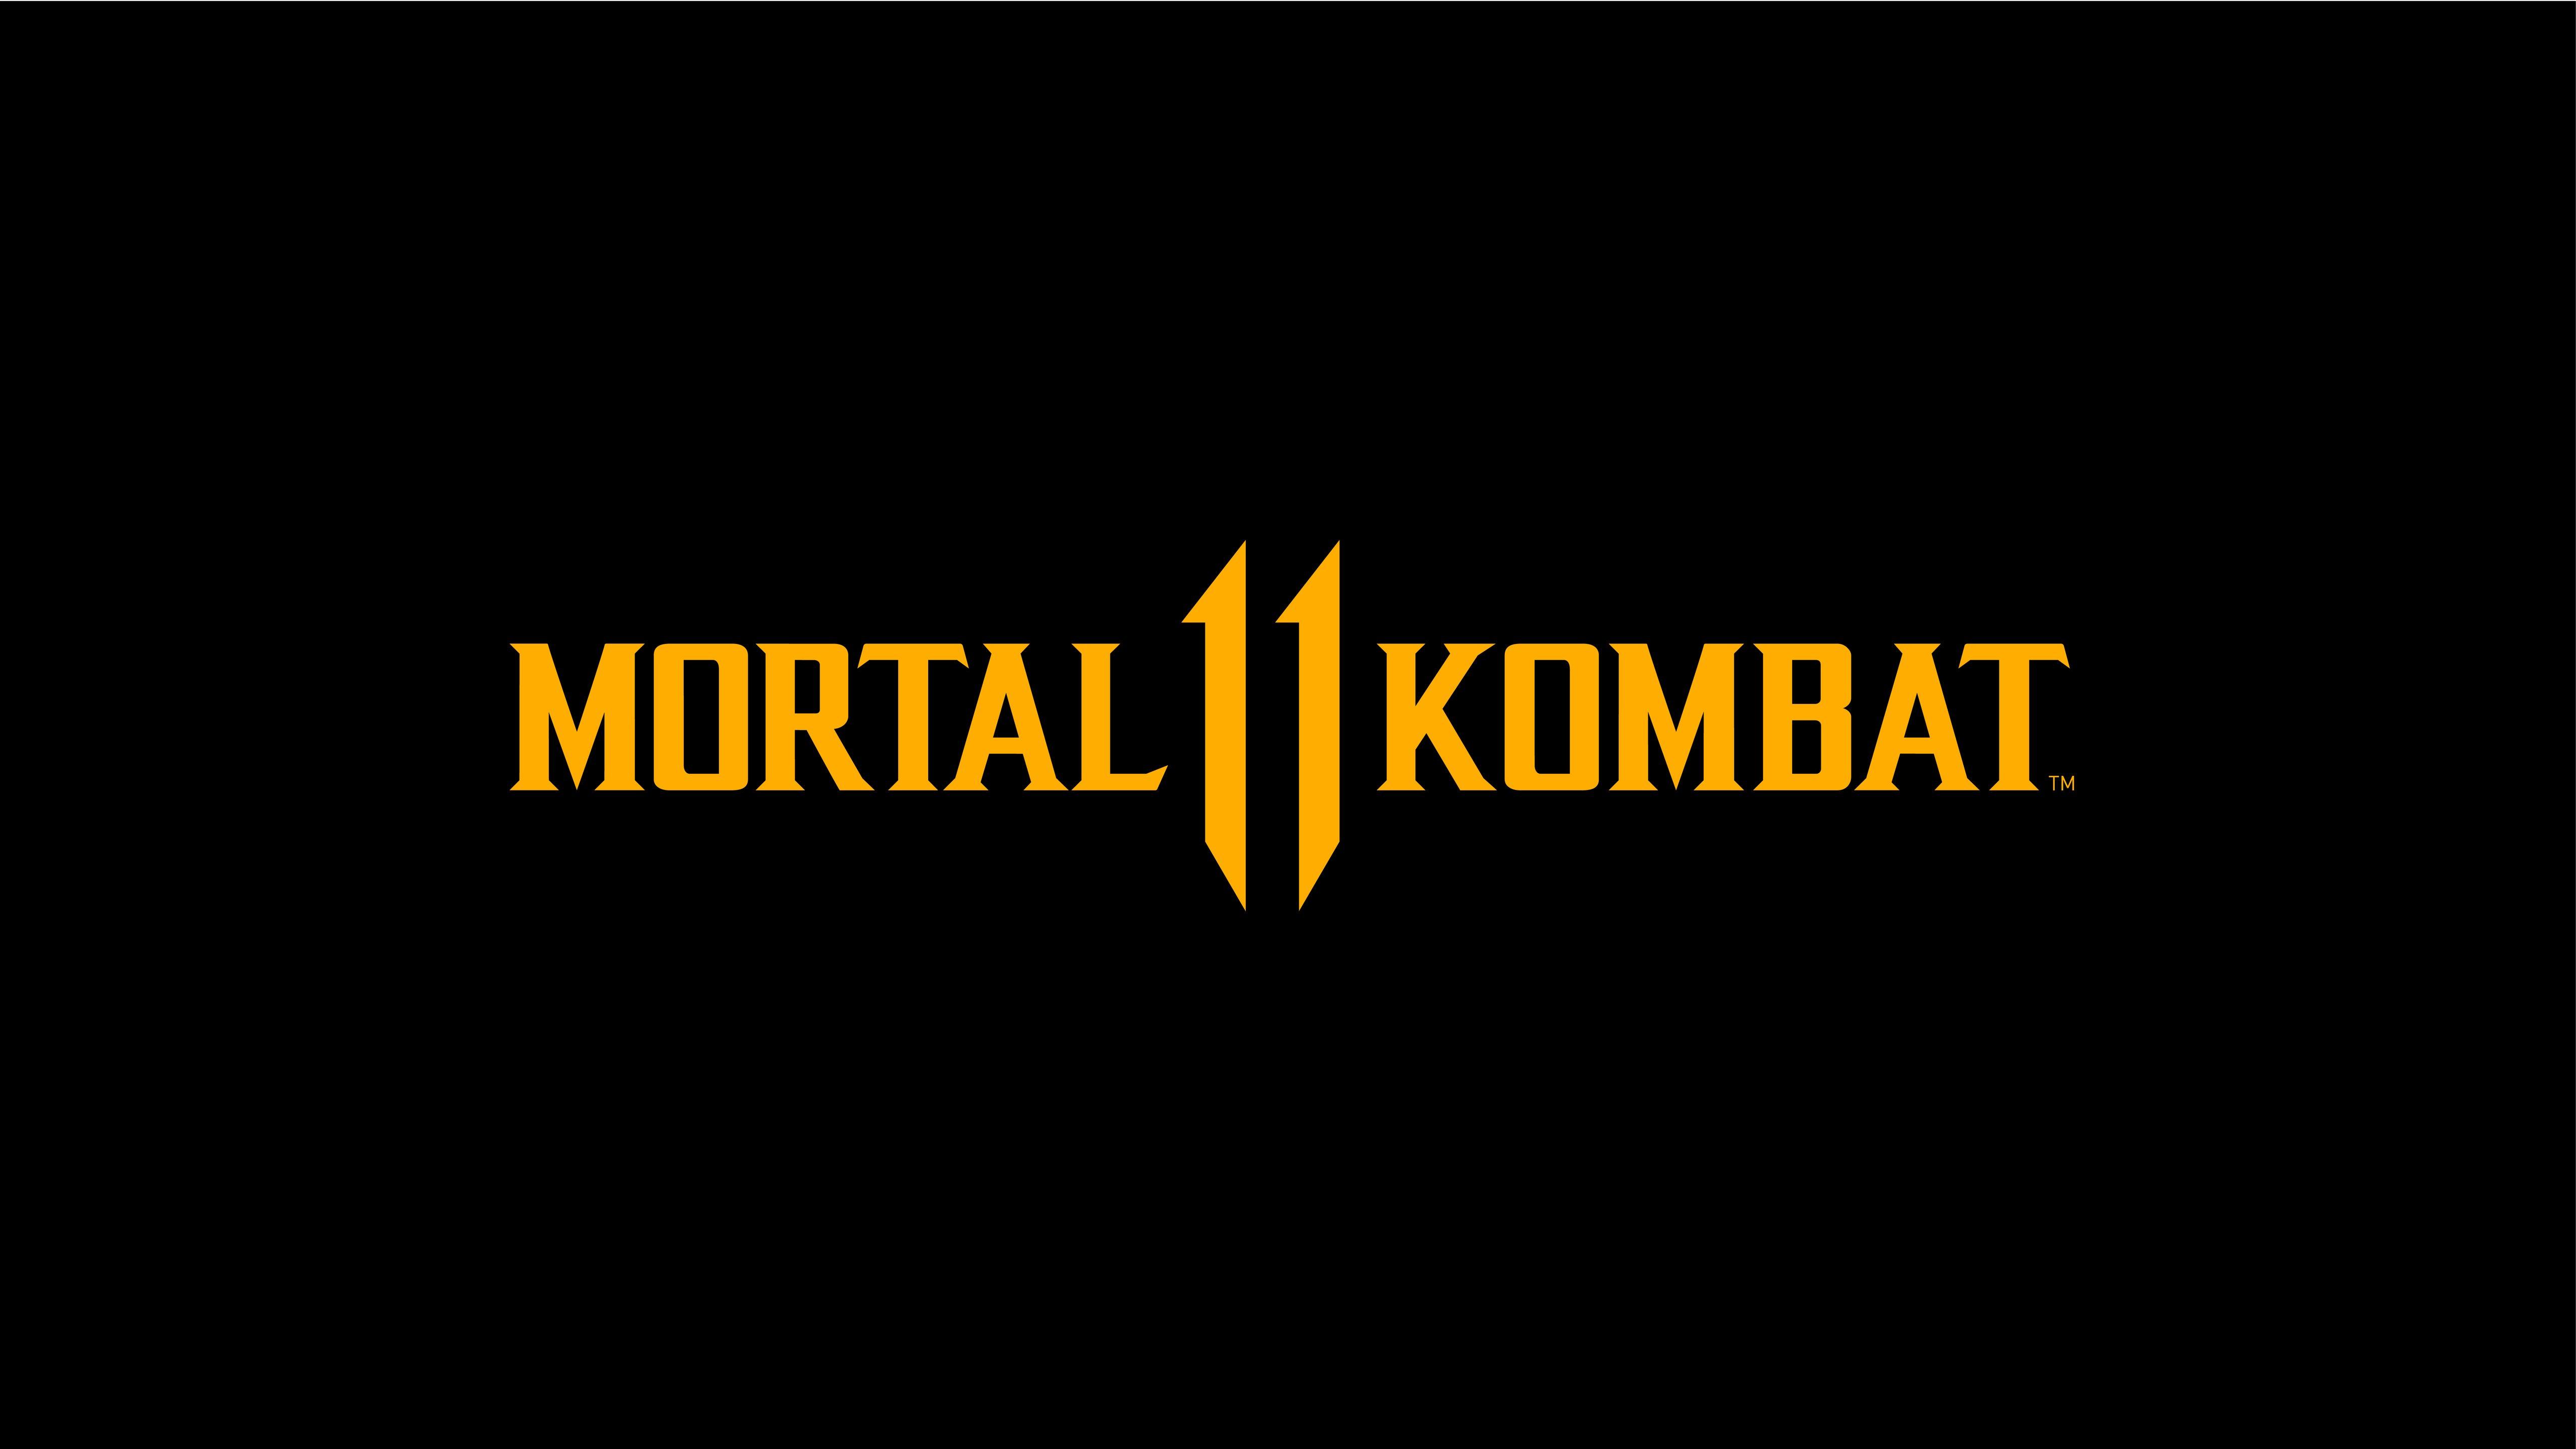 Mortal Kombat 11 Logo Dark Black 8k Mac Wallpaper Download